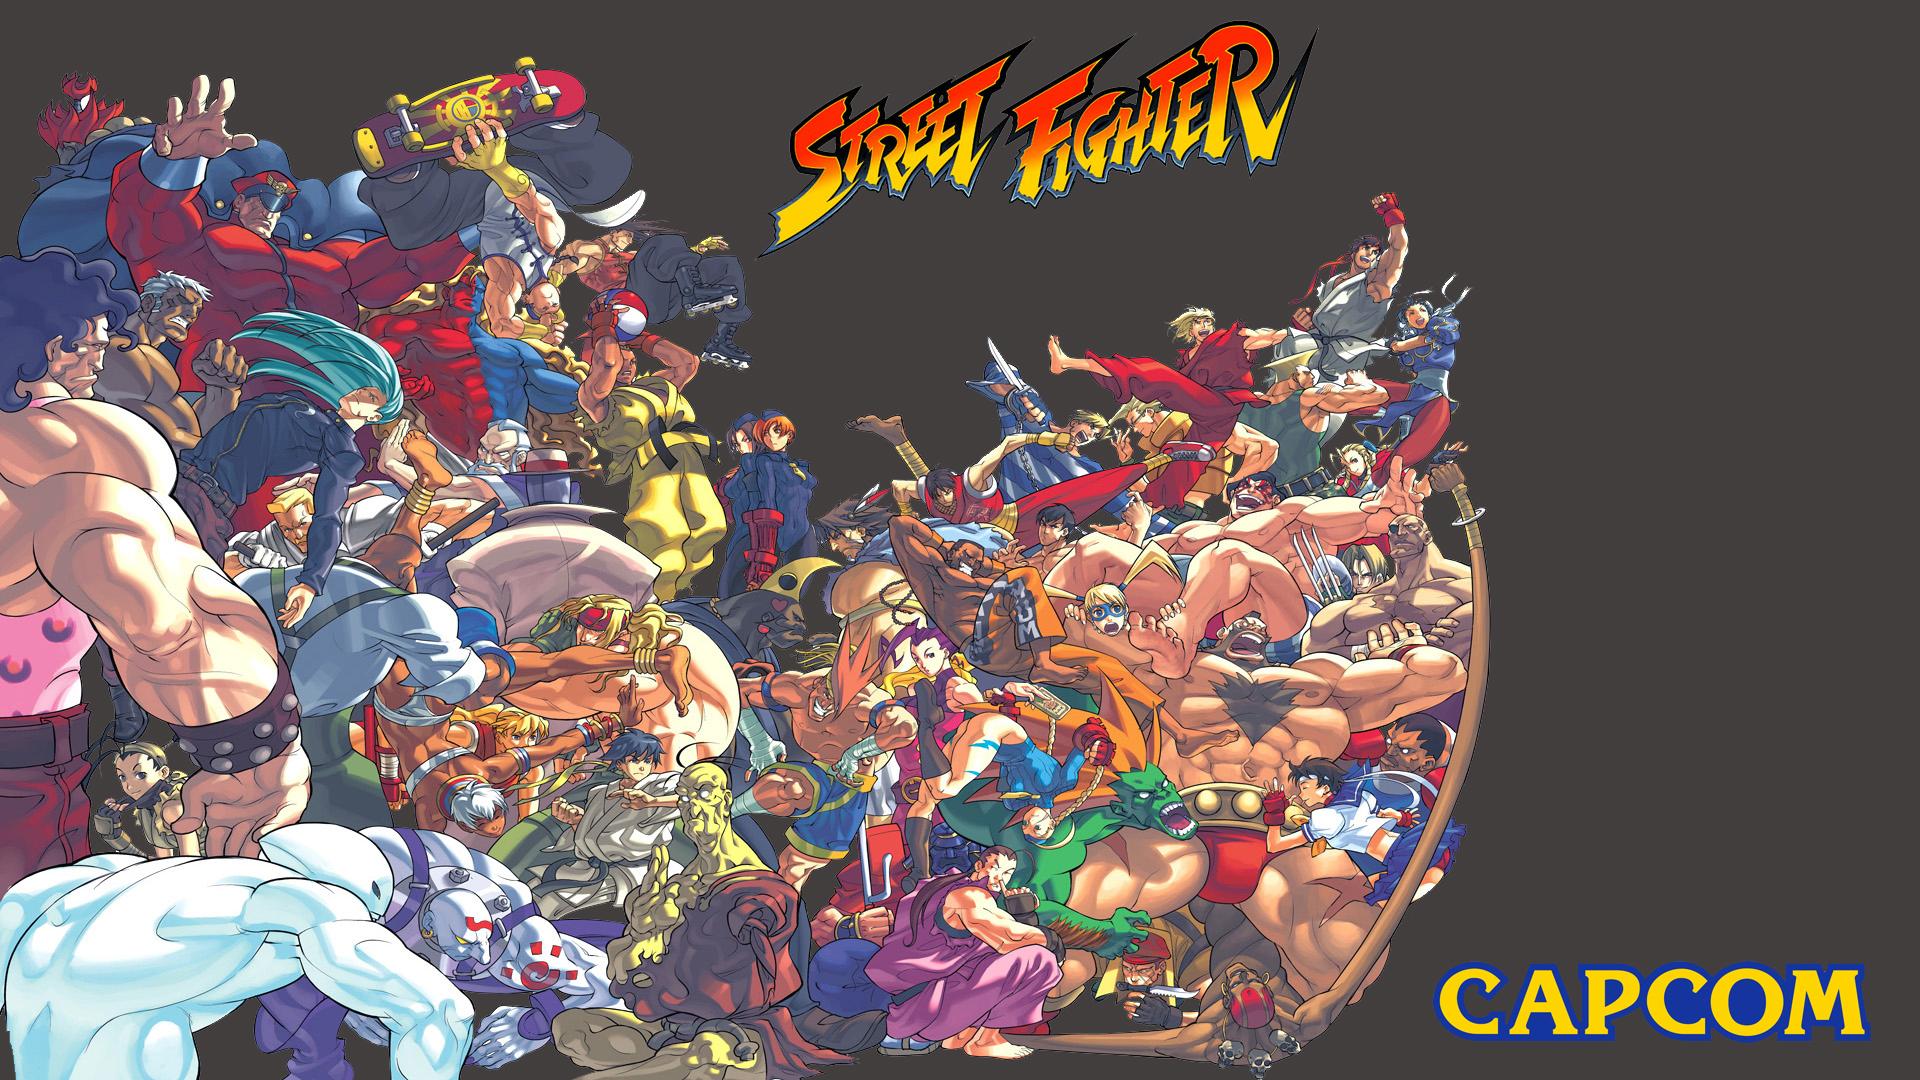 [50+] Street Fighter 5 HD Wallpaper on WallpaperSafari